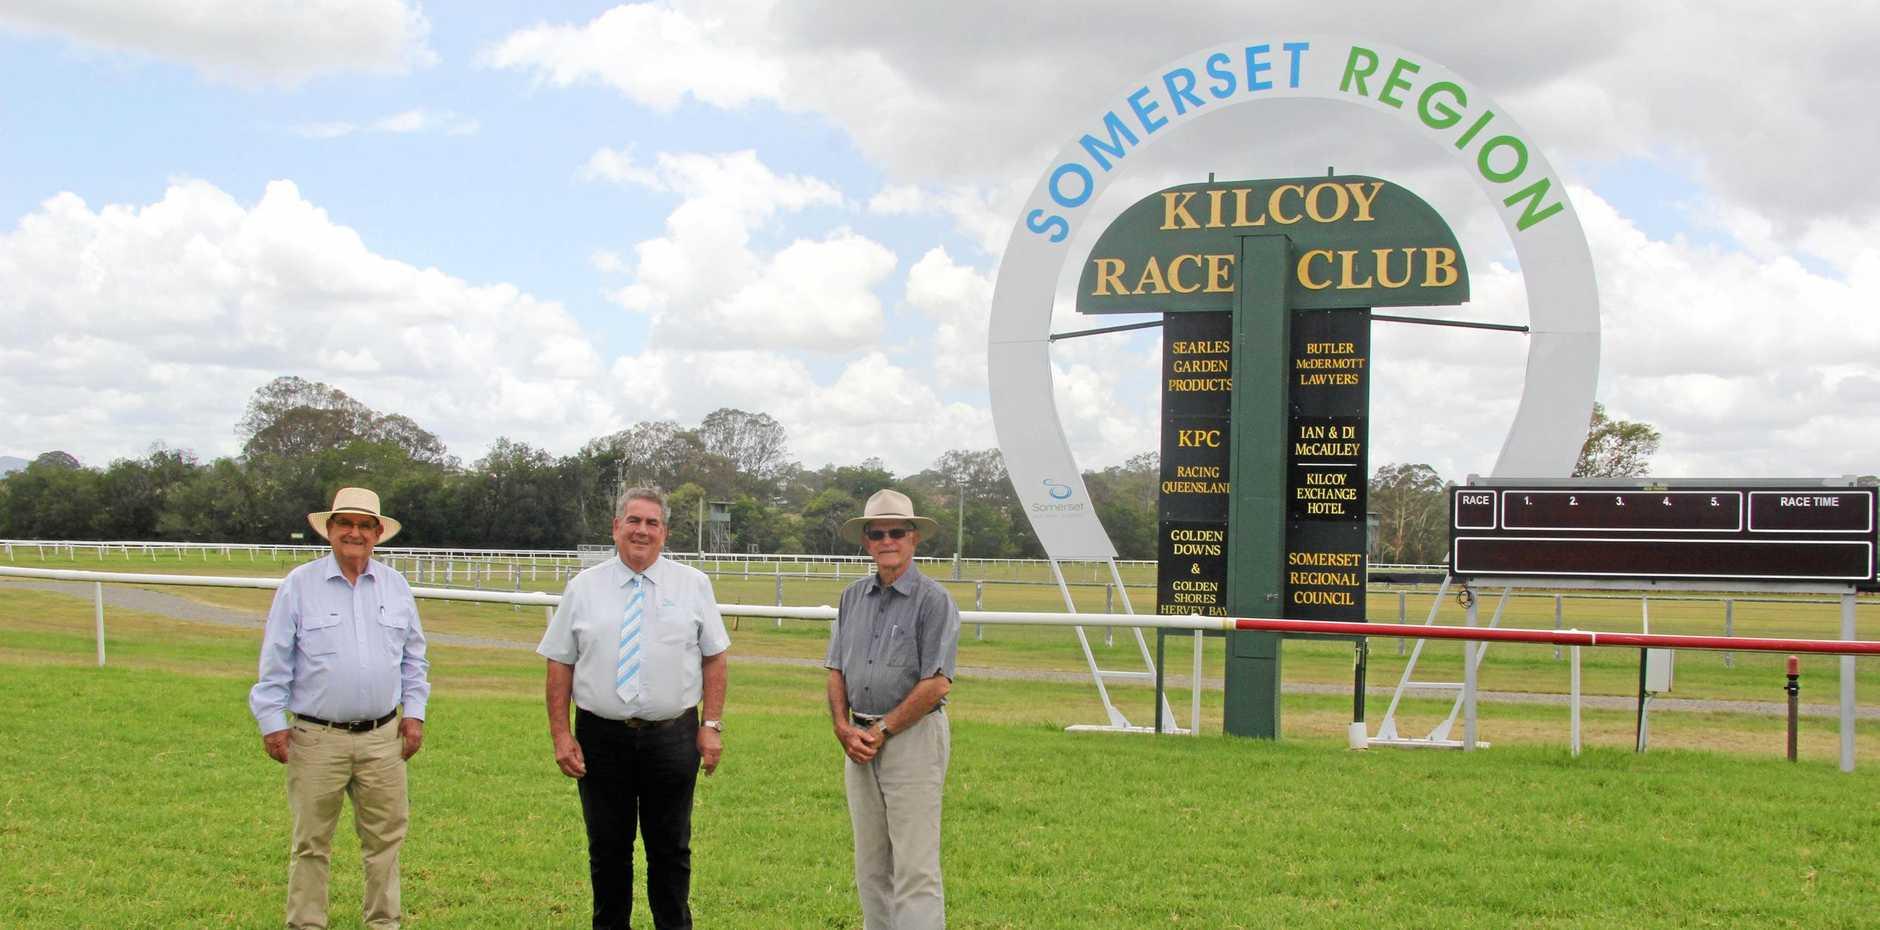 Kilcoy Race Club president Con Searle, Somerset Mayor Graeme Lehmann and Kilcoy Race Club vice-president Ian McCauley near the new Kilcoy Racecourse finish post.